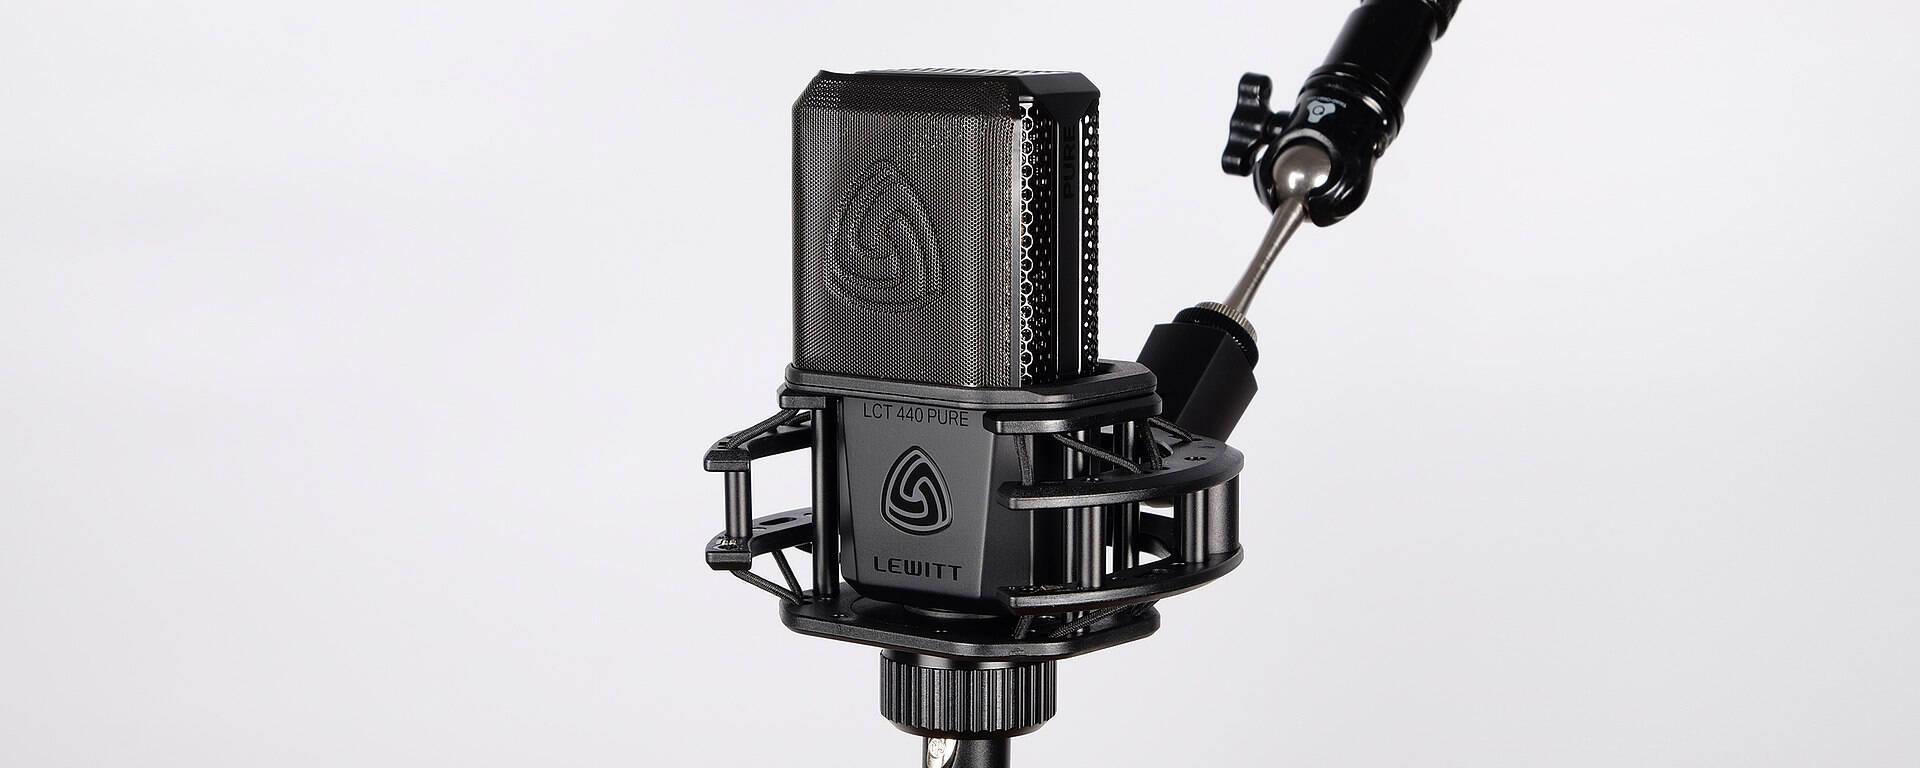 LCT-440-PURE-Box-content